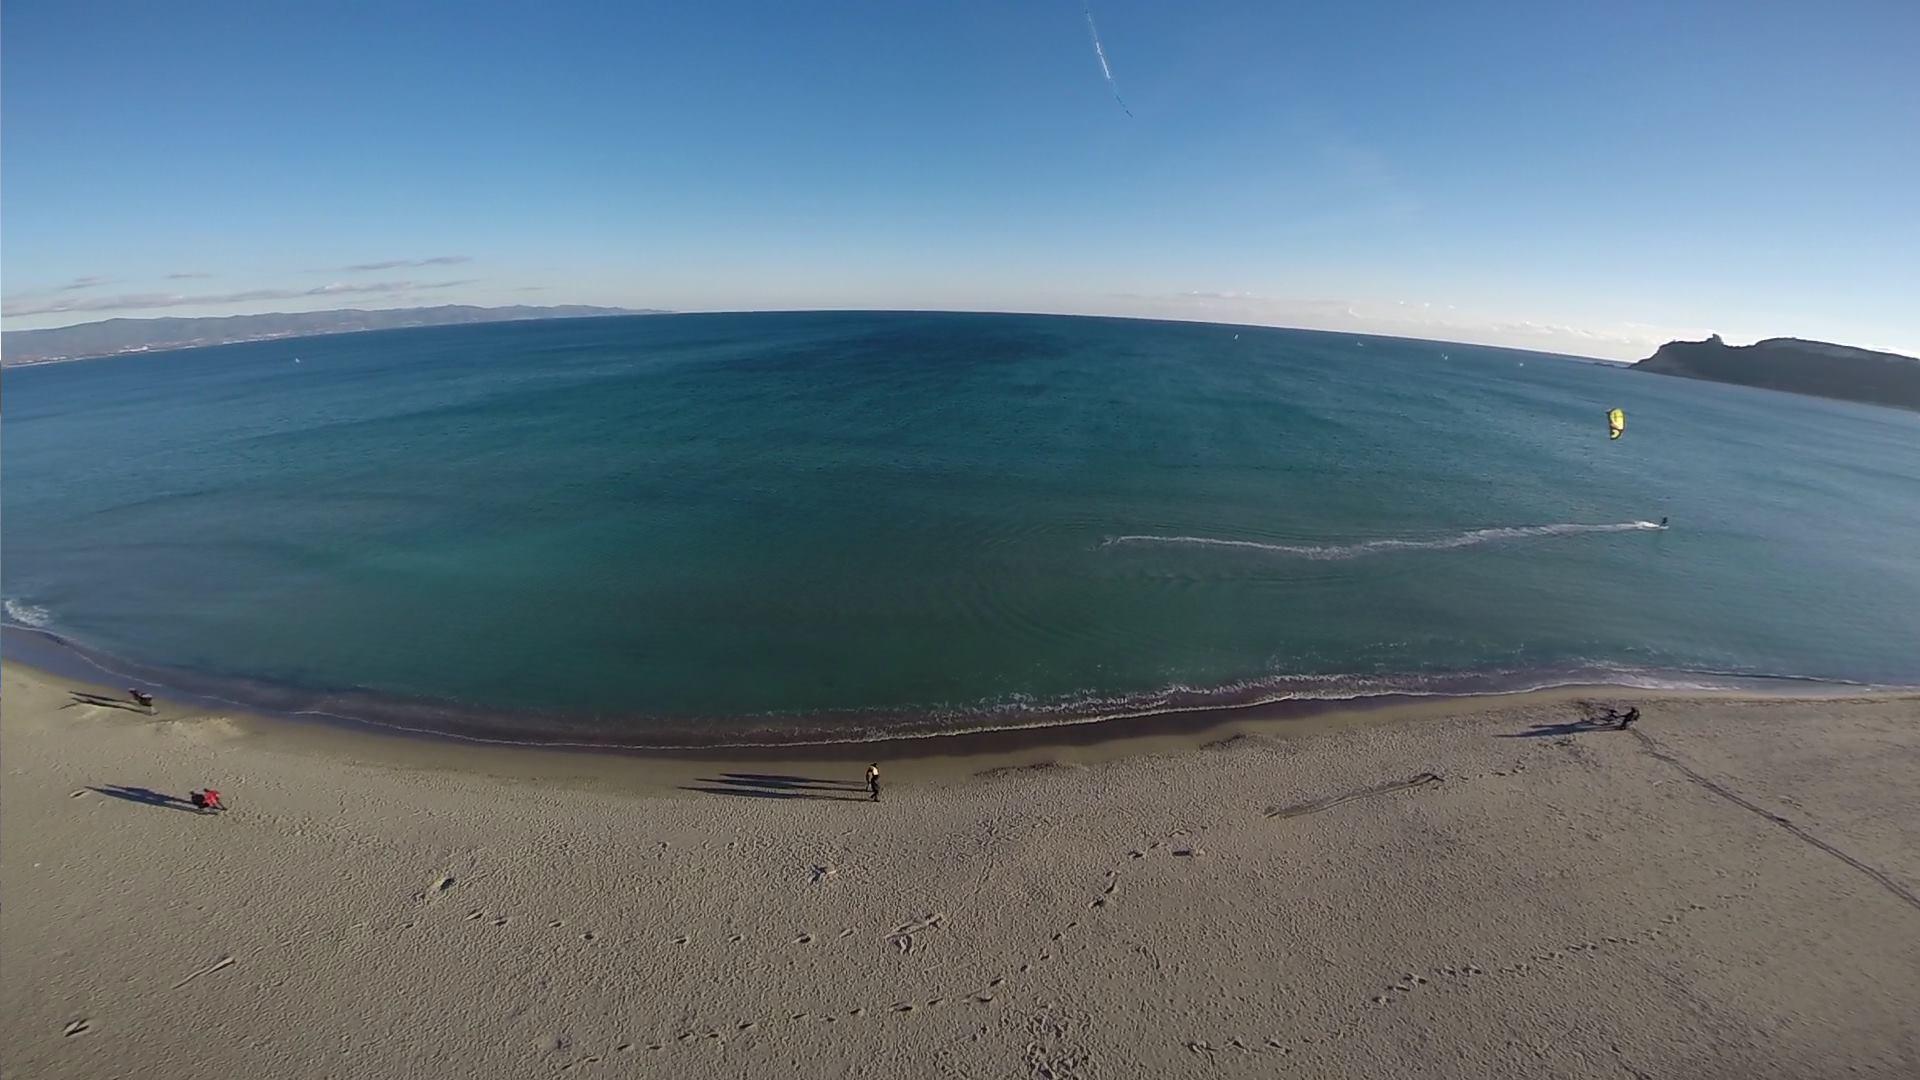 Kitesurfing Poetto Beach Cagliari | Kiteboarding Southern Sardinia